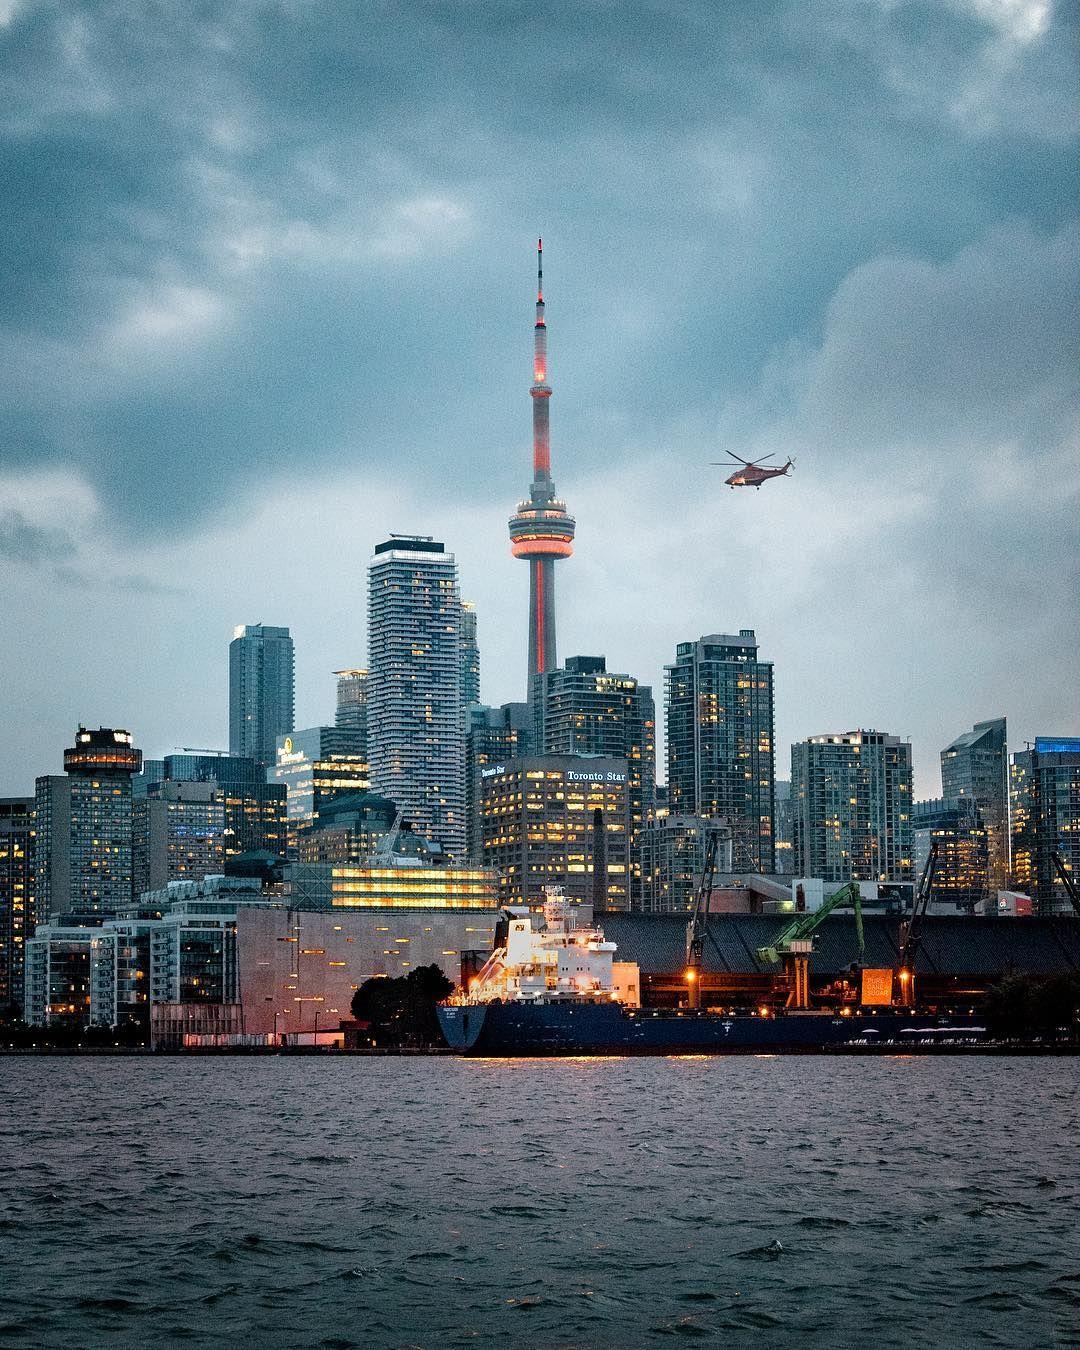 Pin on Toronto, Canada Travel Photos